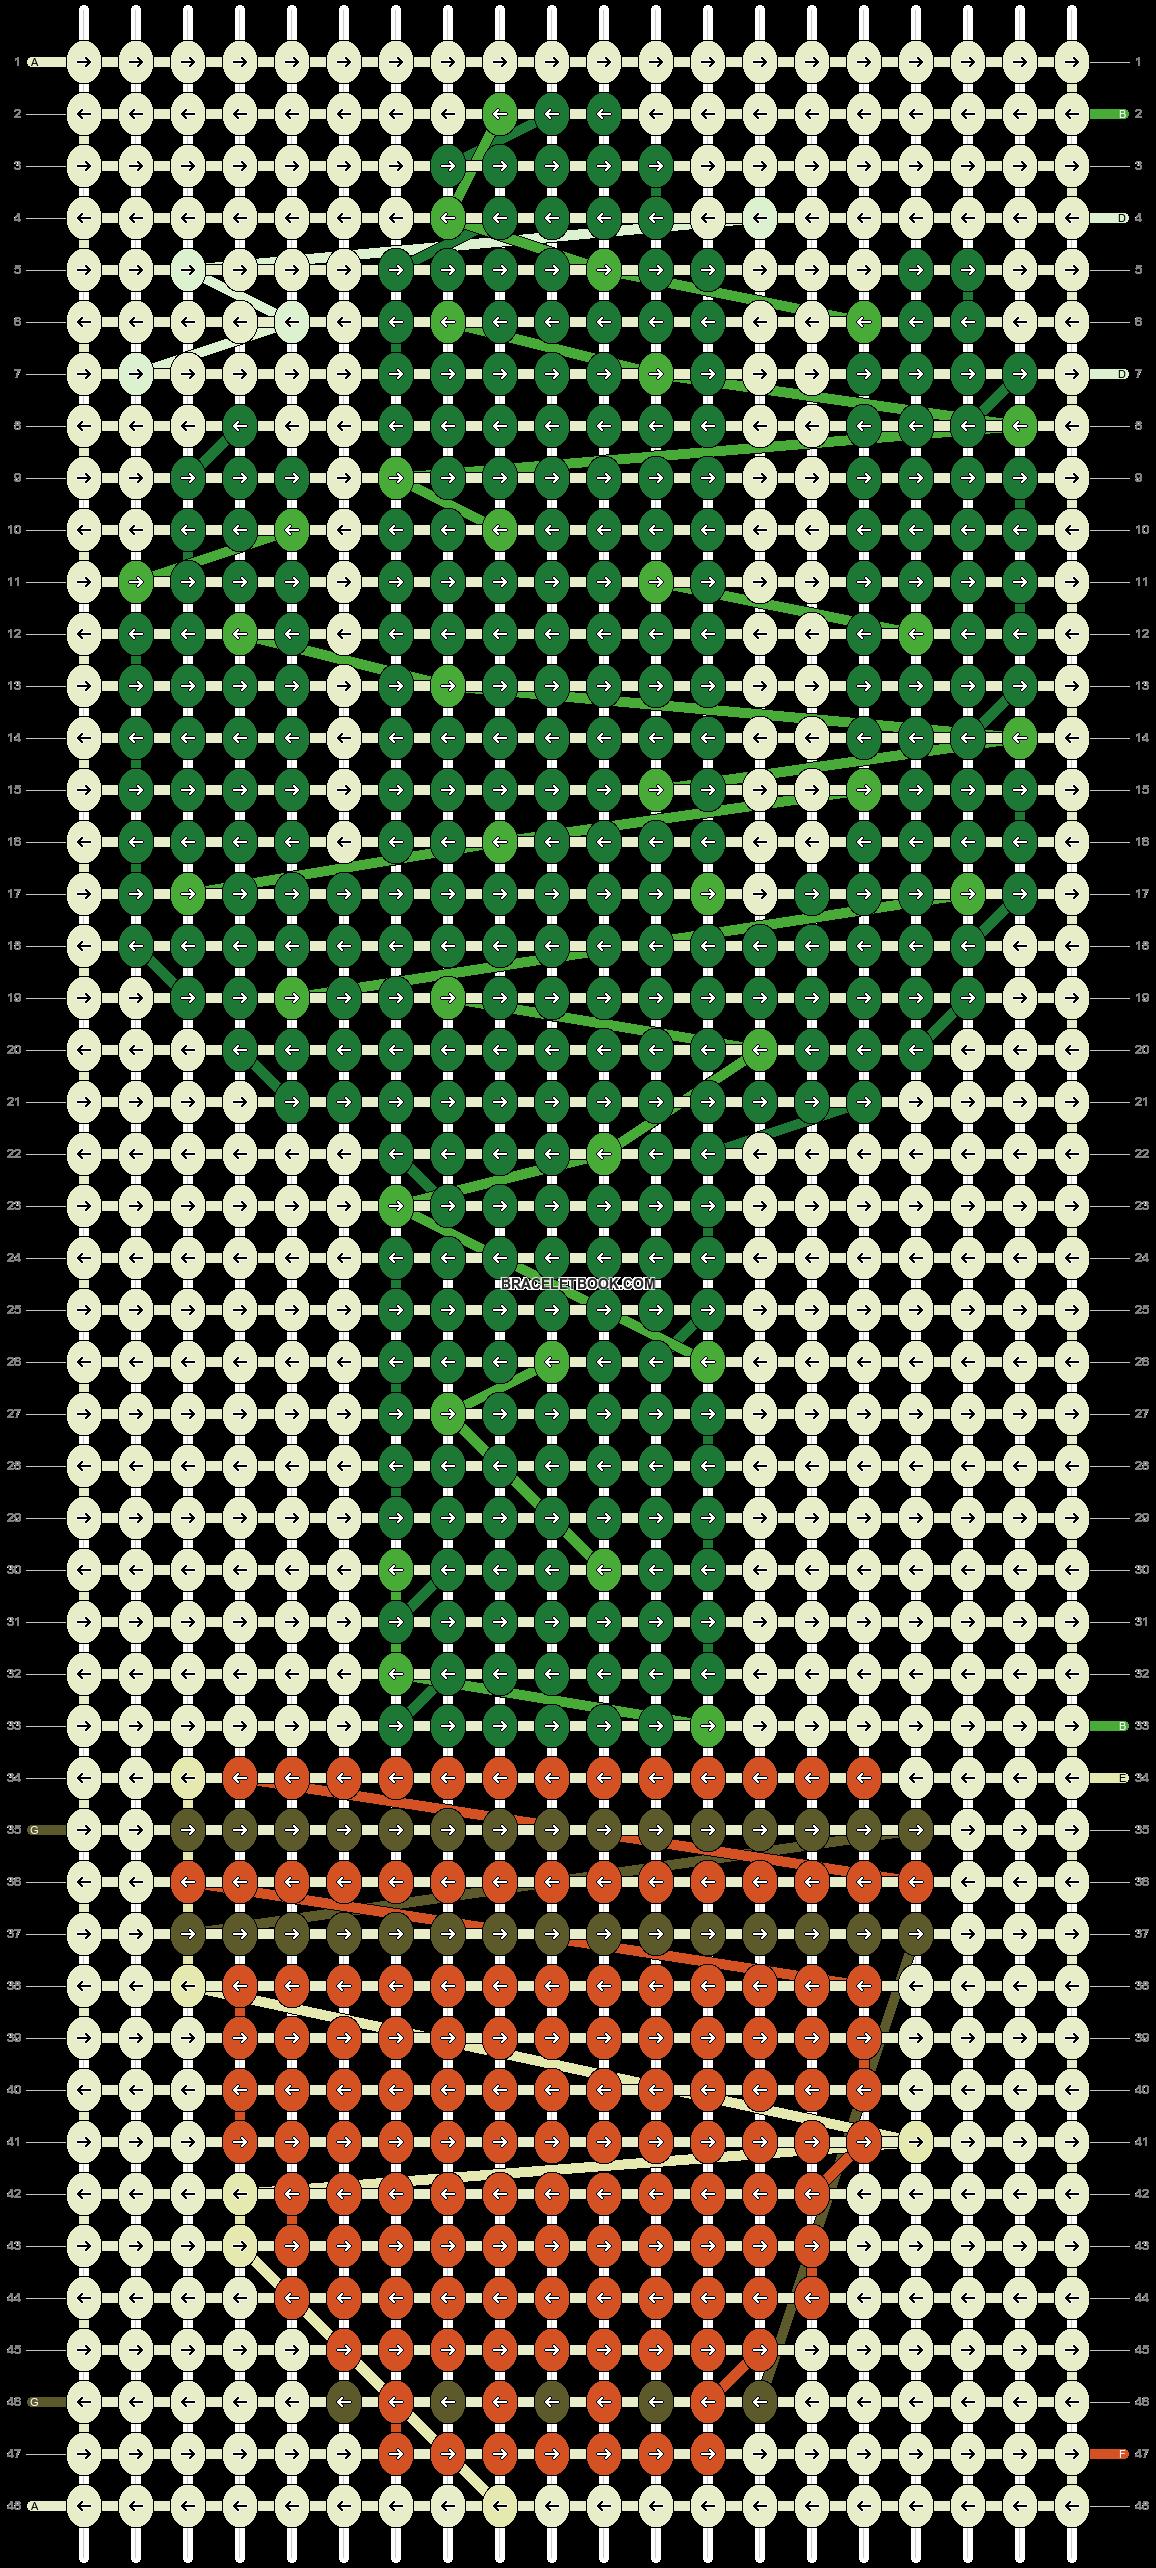 Alpha Pattern #20415 added by yukisut